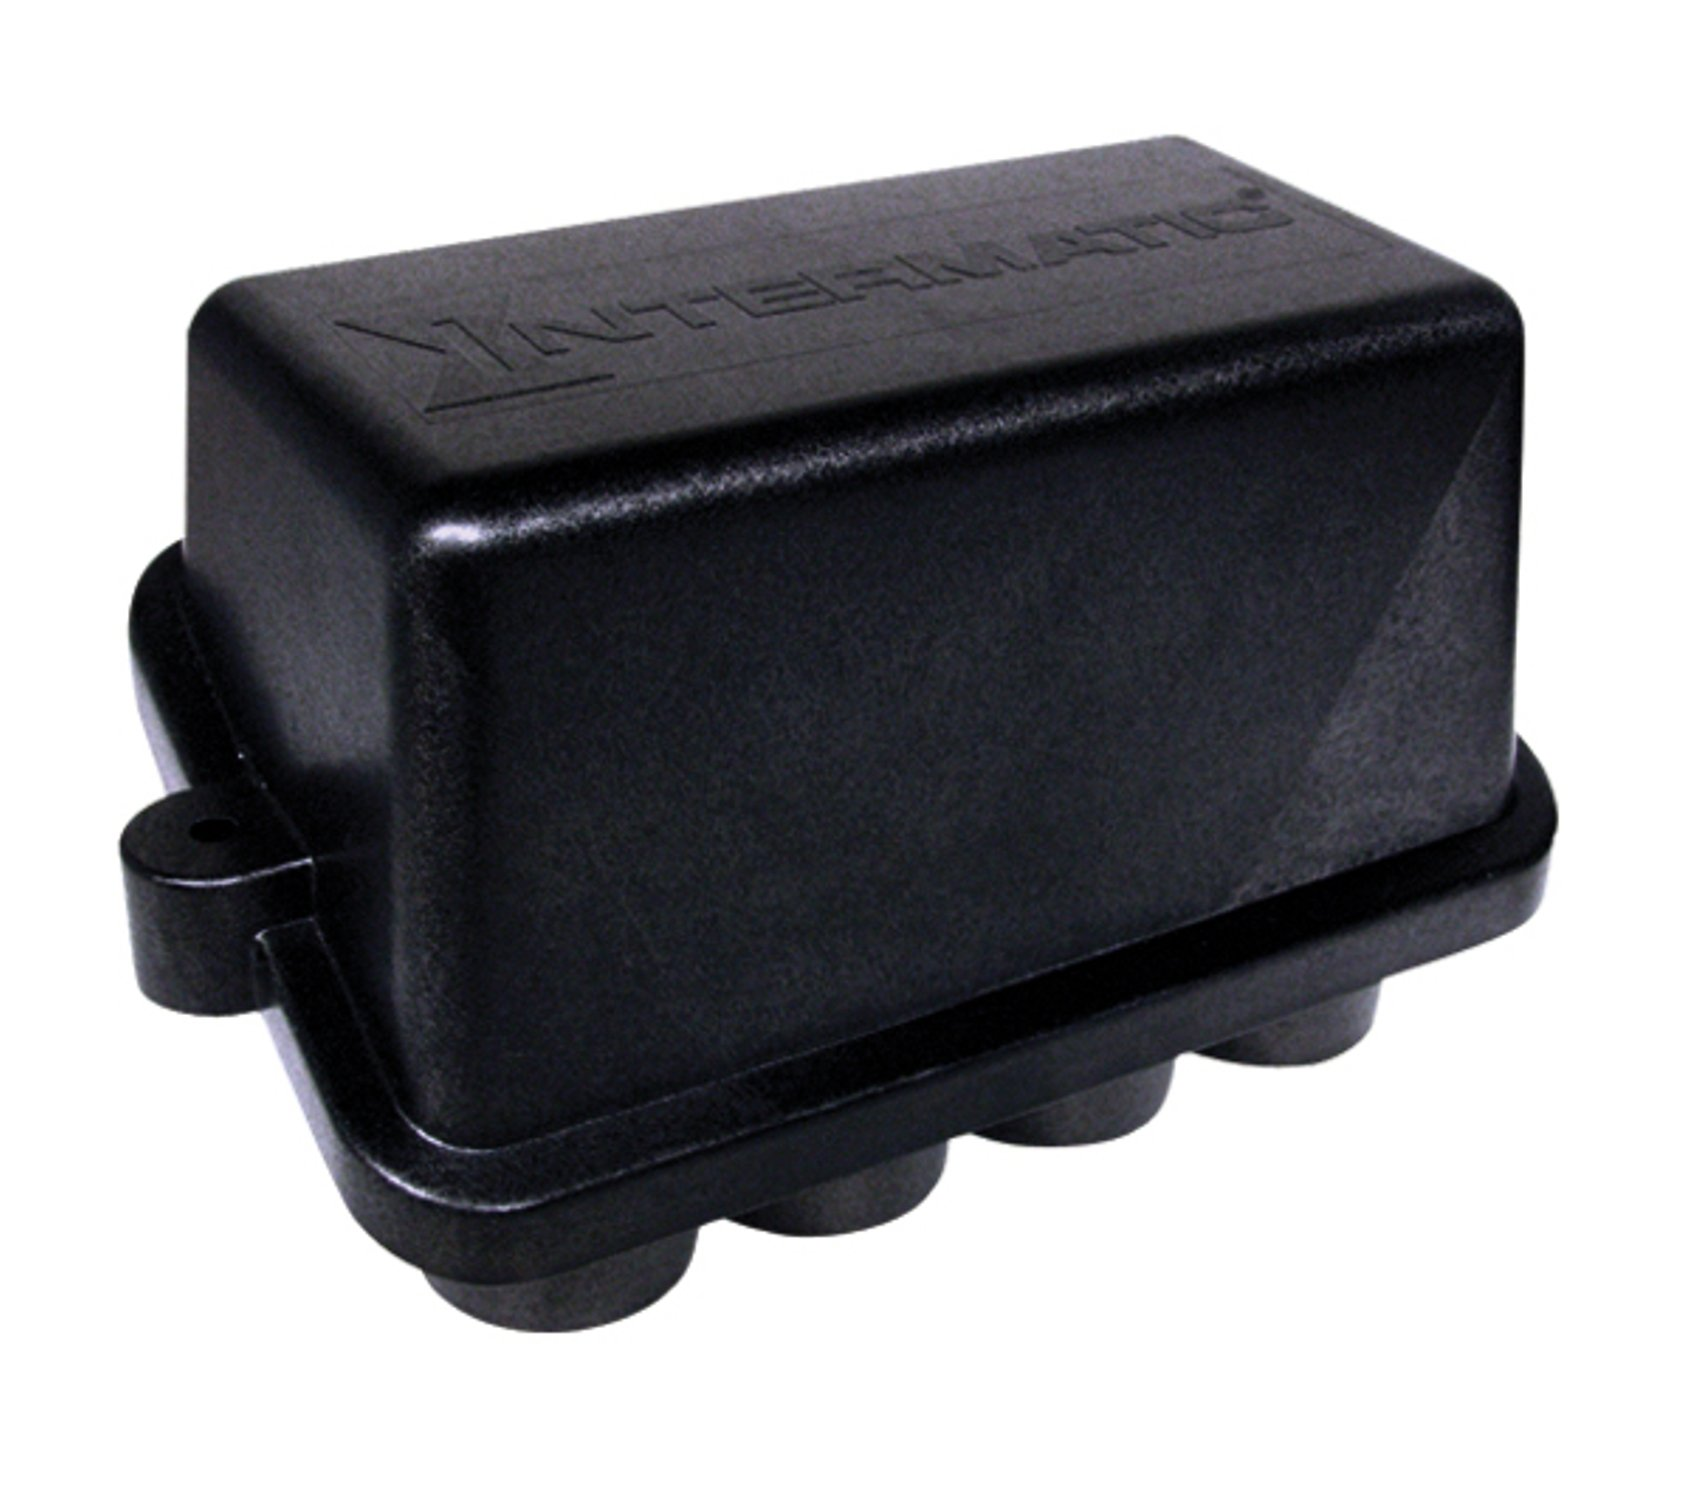 Intermatic PJB4175 4-Light Pool/Spa Junction Box